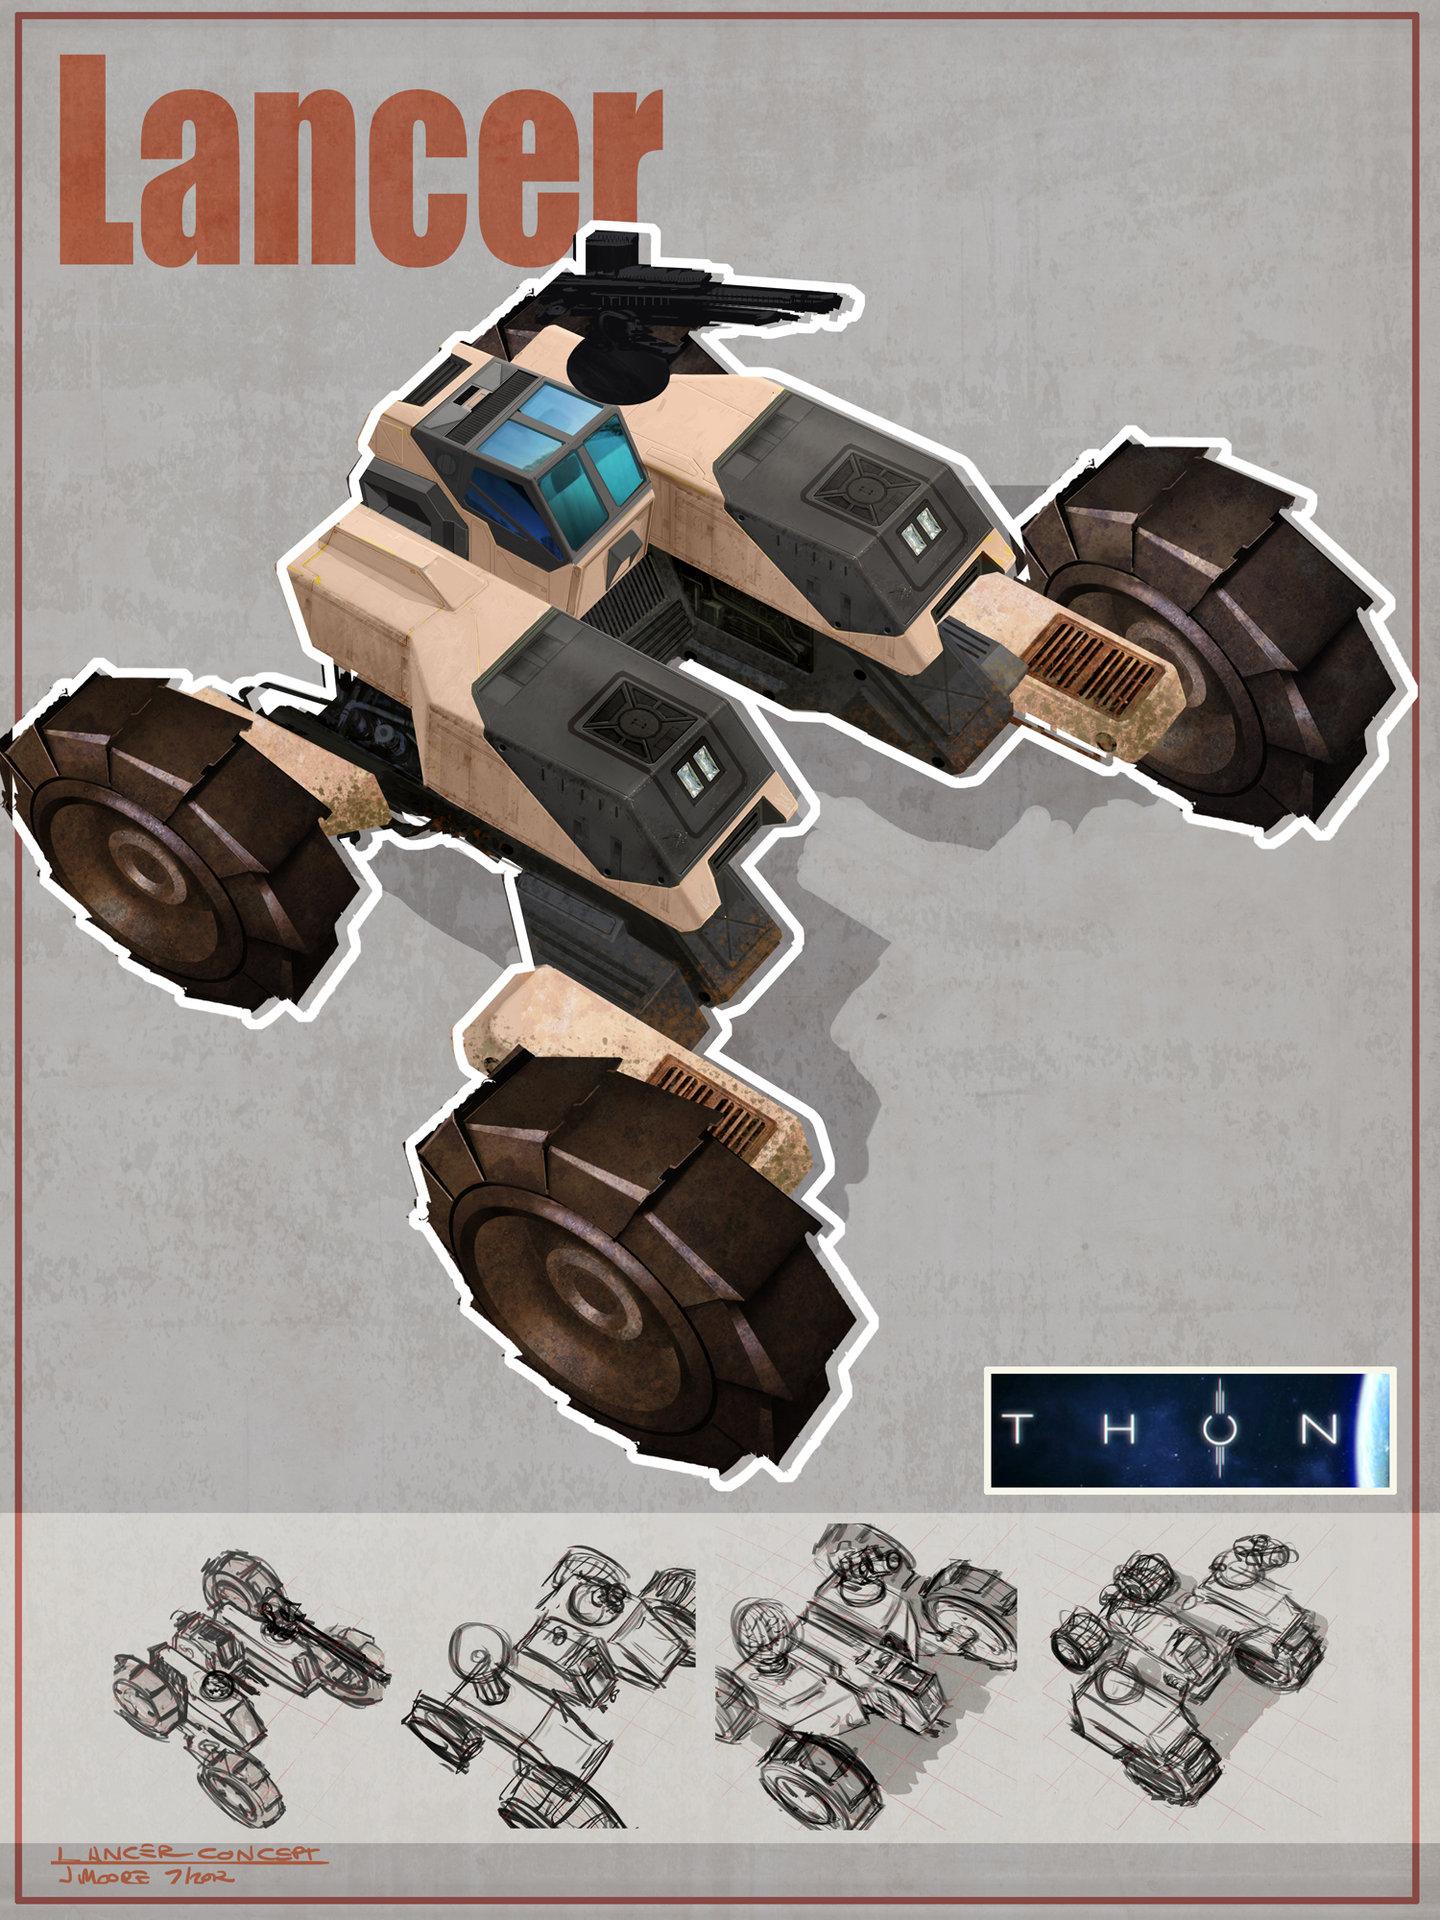 Vehicle design 2